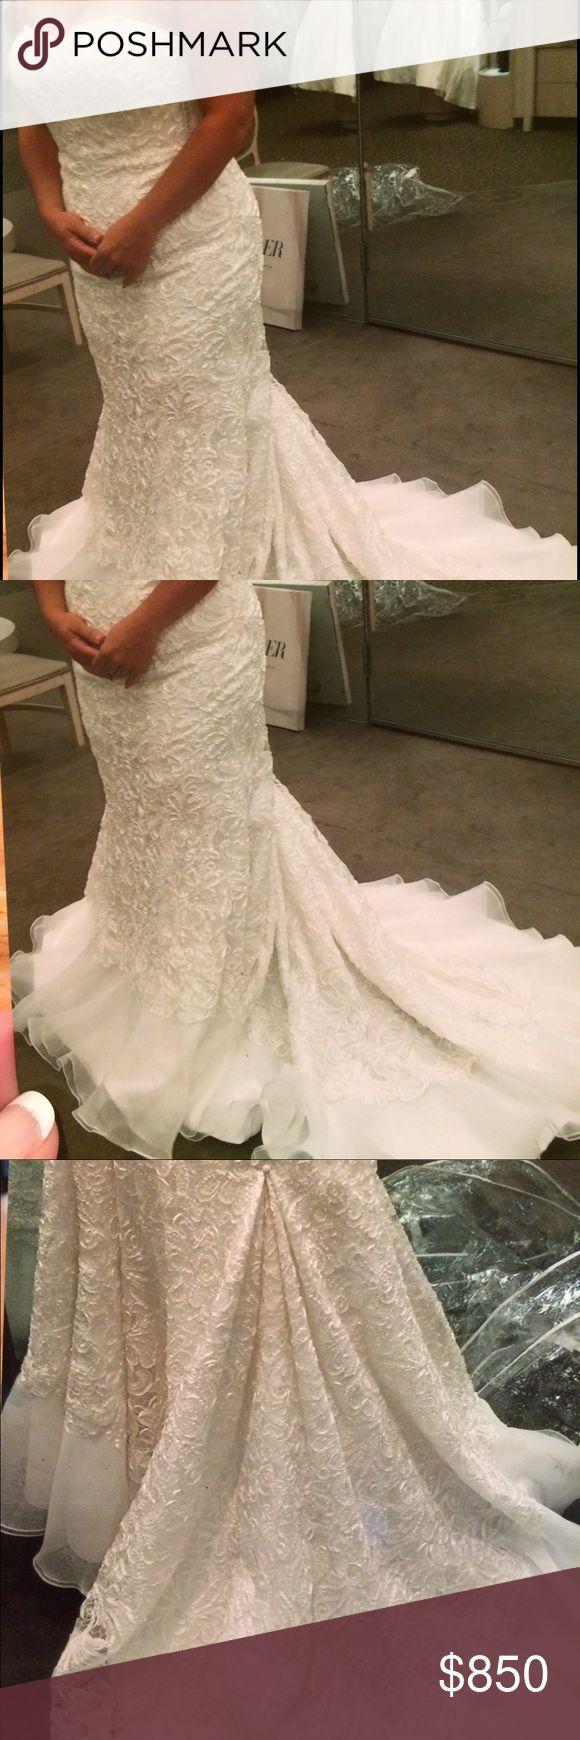 Galina Signature wedding gown Street size 14, dress size 16w.  Also listed on Craigslist. Galina Signature Dresses Wedding